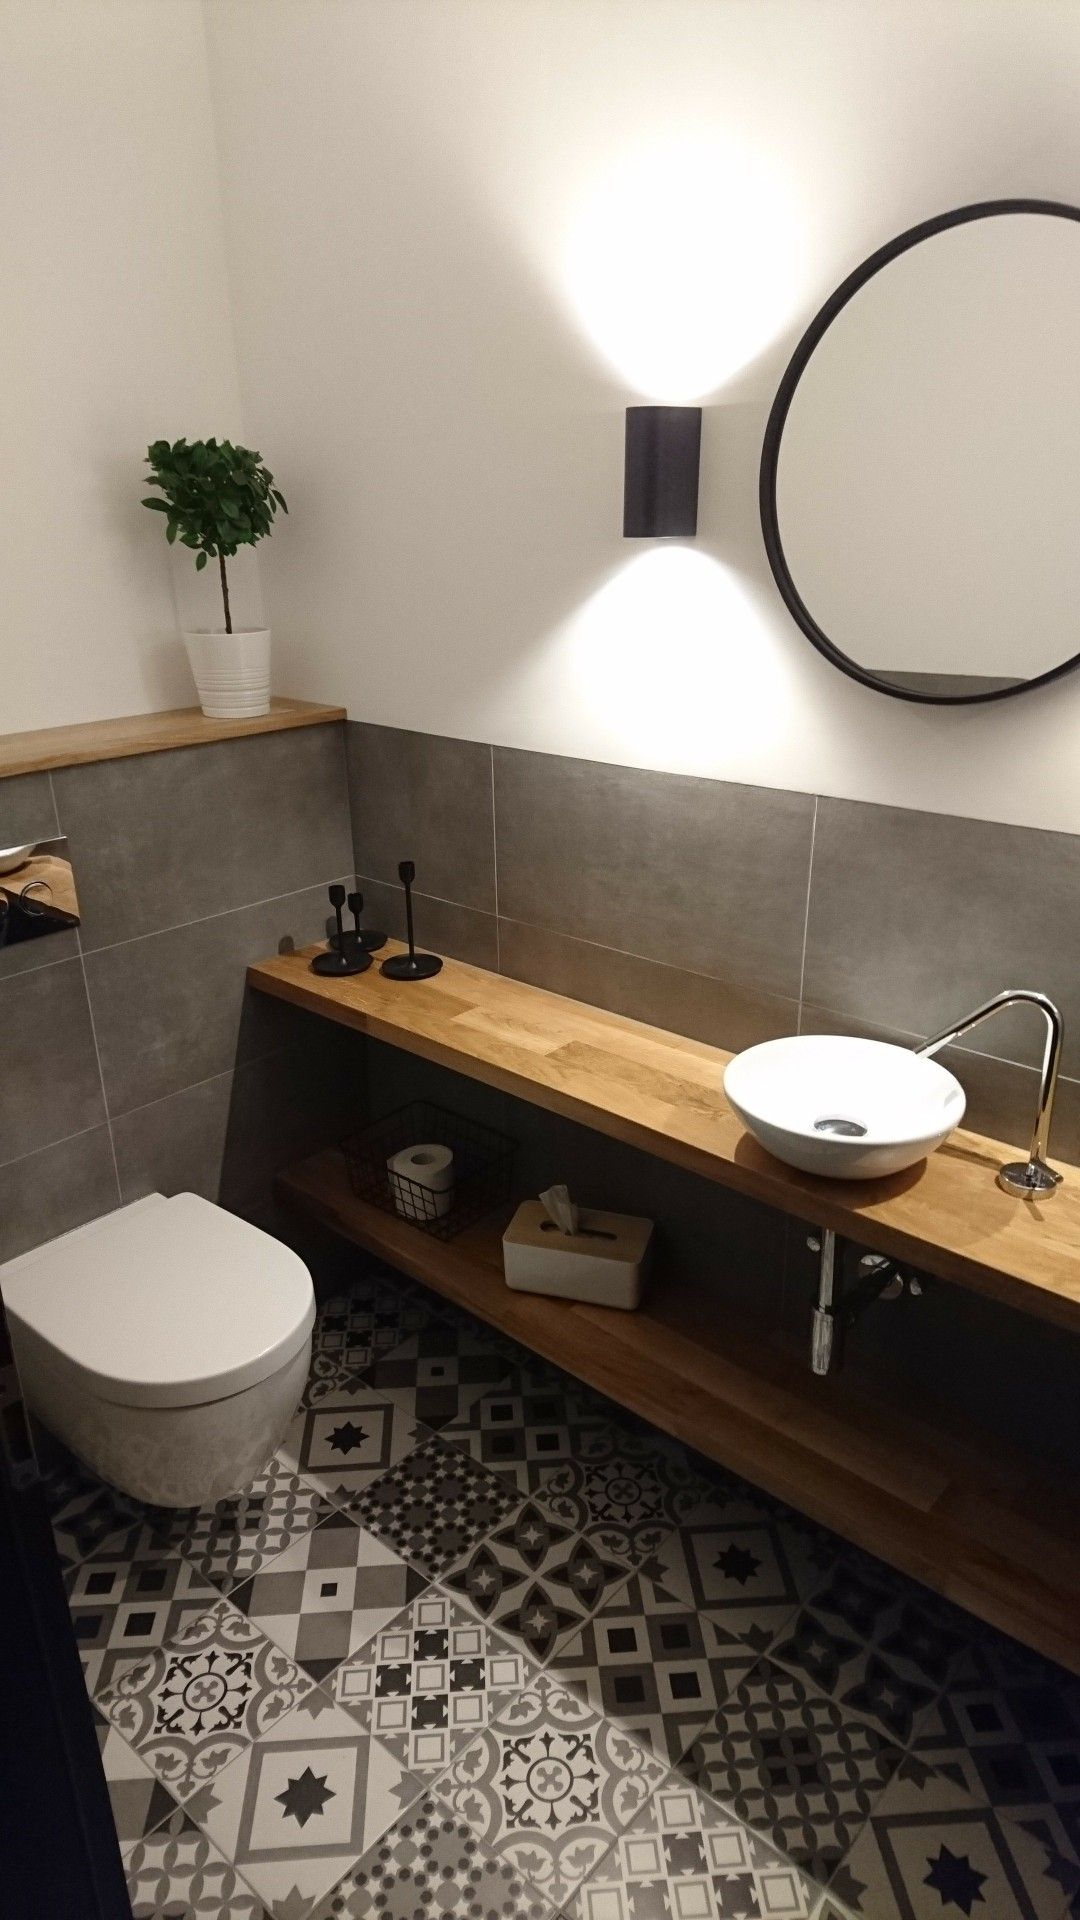 Gaste Wc Retro Fliesen Eiche Guest Toilet Retro Tiles Oak Bathroom